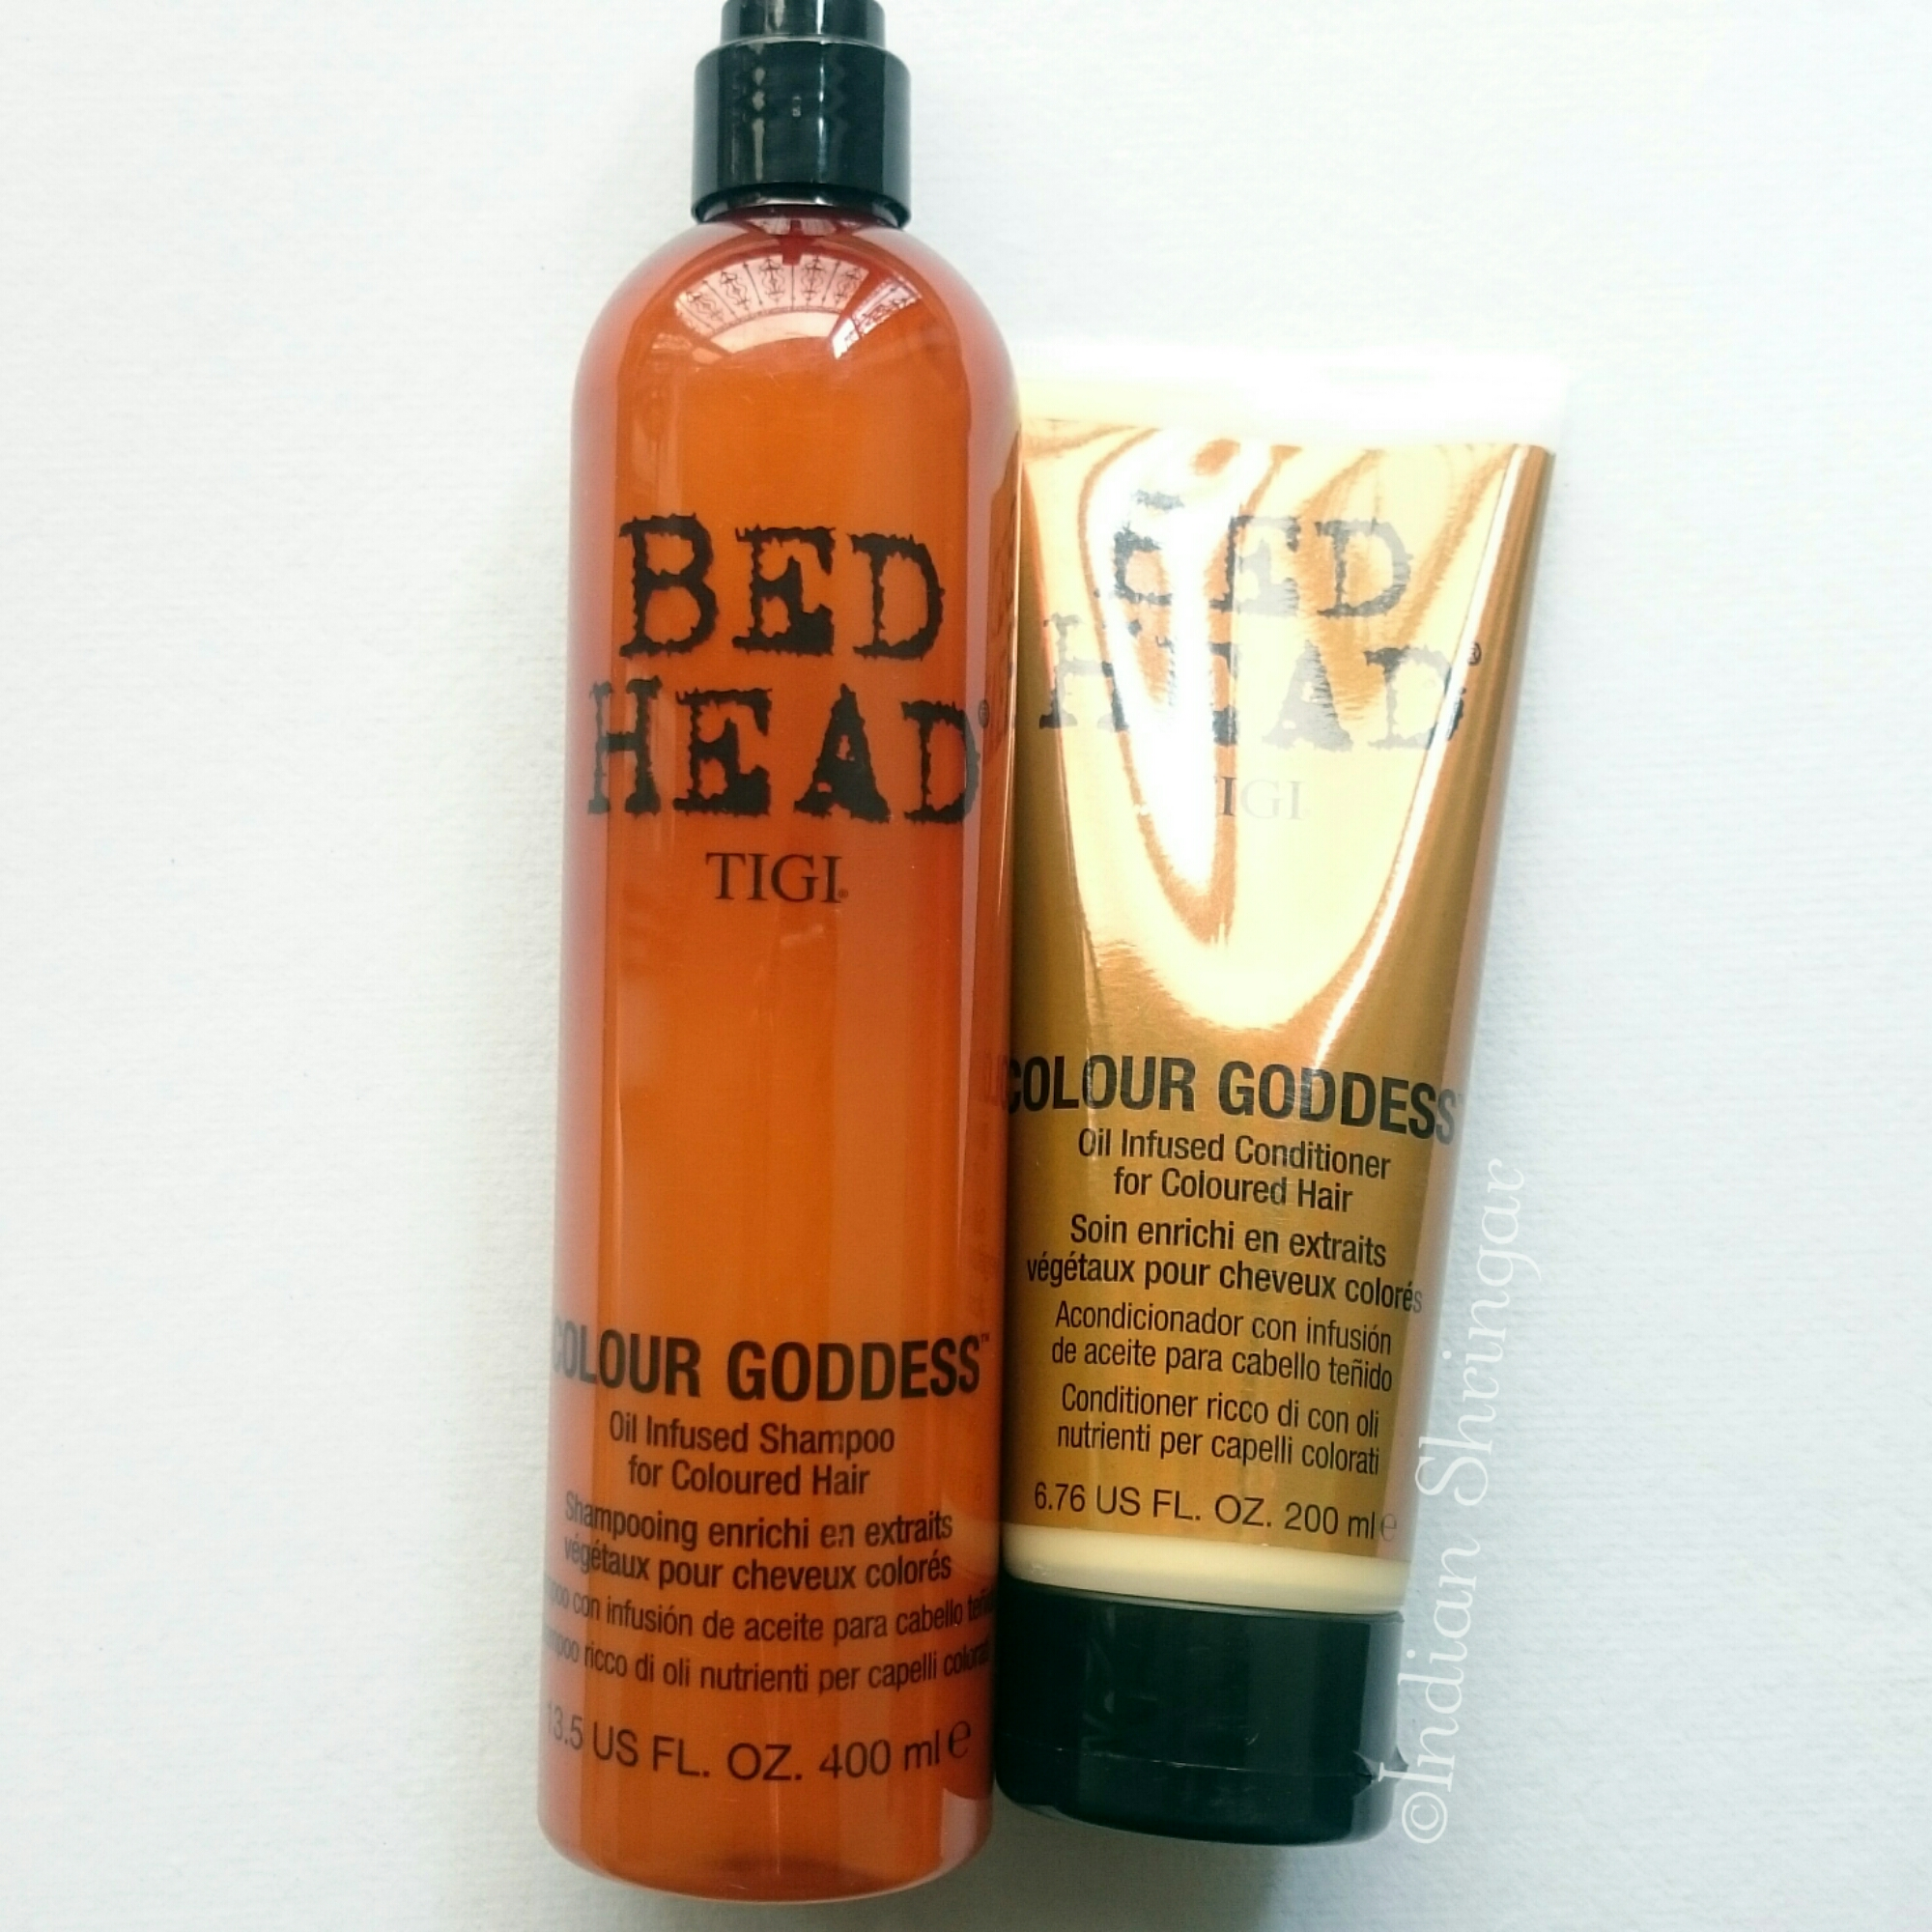 Tigi Bed Head Colour Goddess Shampoo And Conditioner Review The